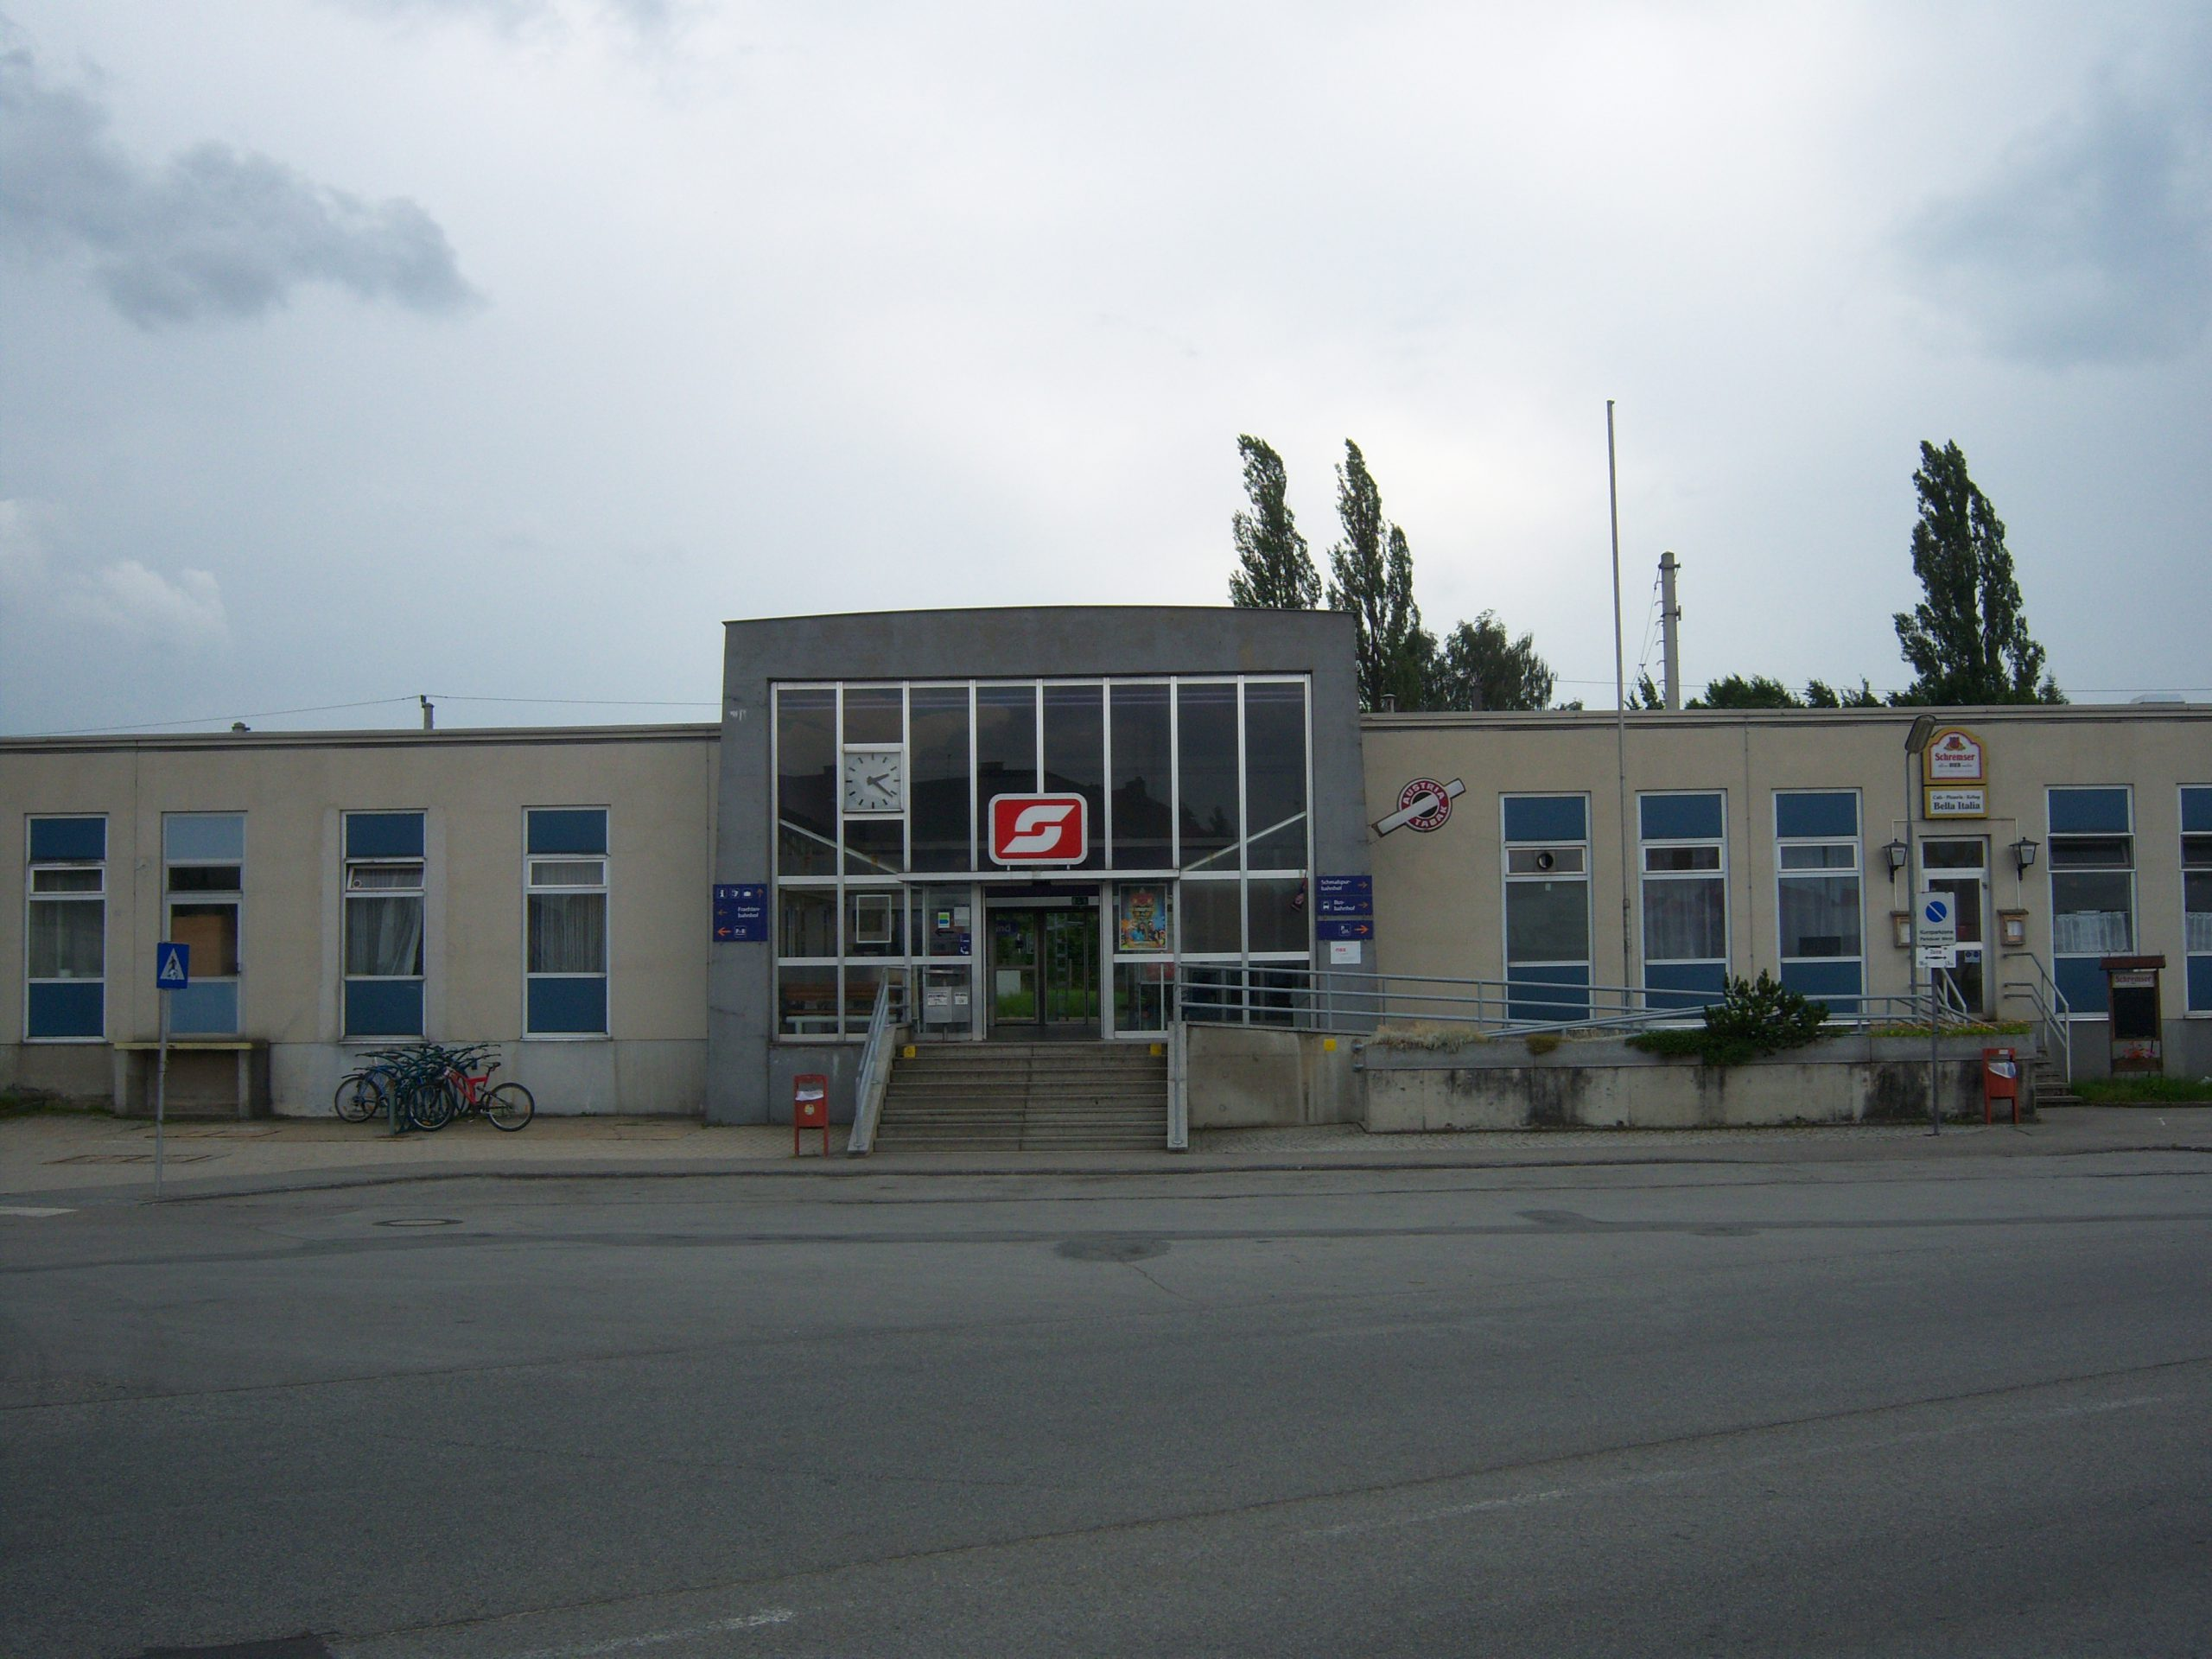 Bahnhof Gmünd 6.Juli 2010 Quelle: Wikipedia.org